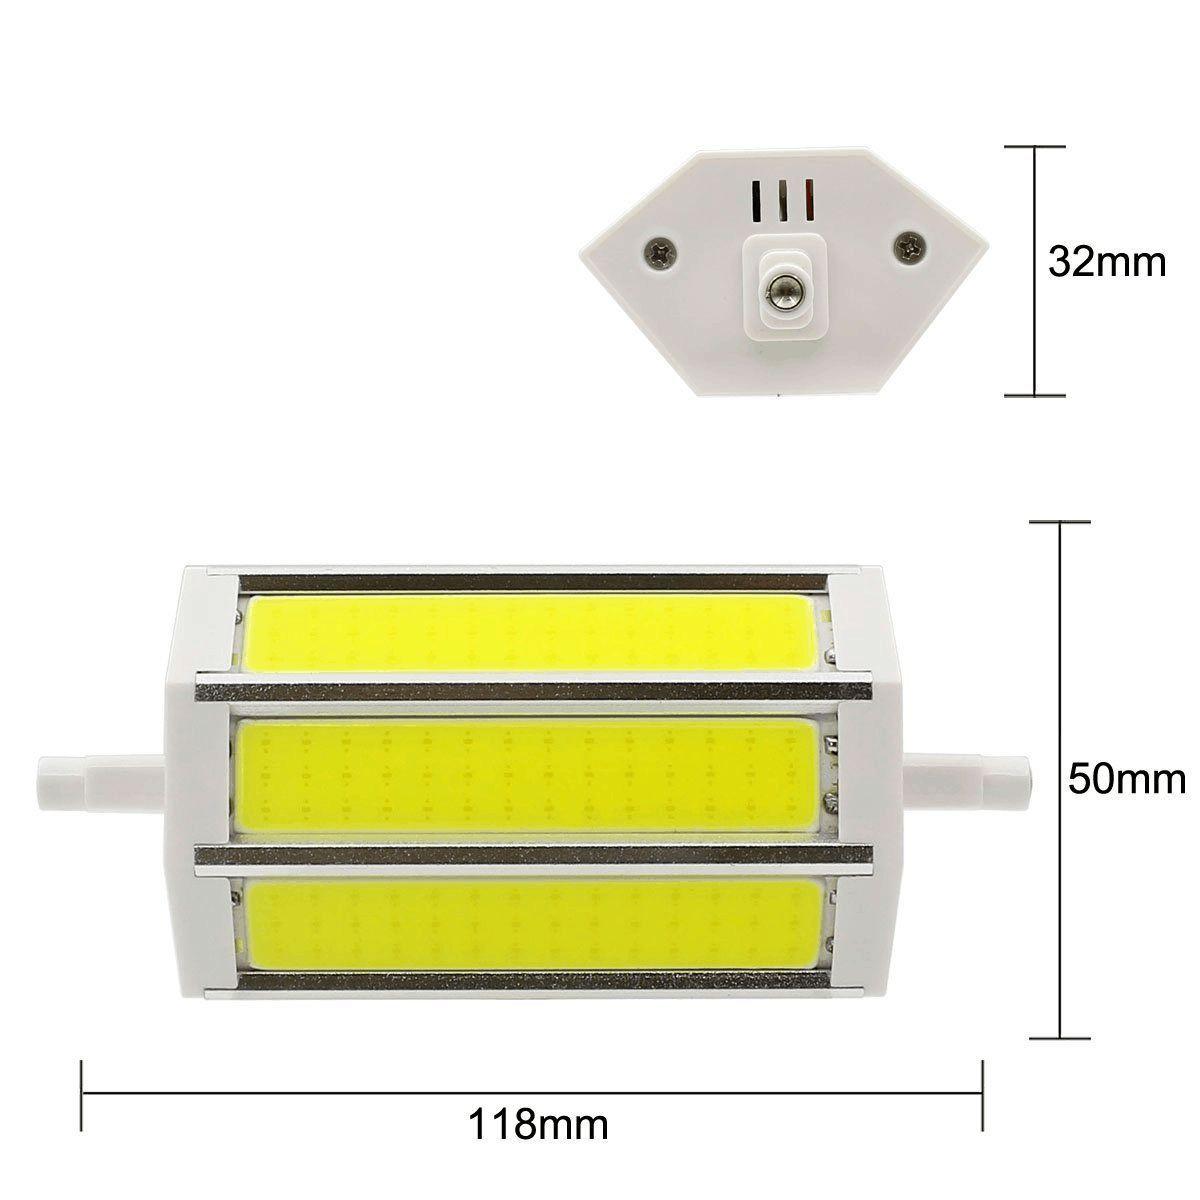 R7S 118 millimetri COB lampadina LED R7S 10W / 800LM - Non-dimmable - AC85-265V J Doppio 80W R7S J118 lampada alogena sostitutiva